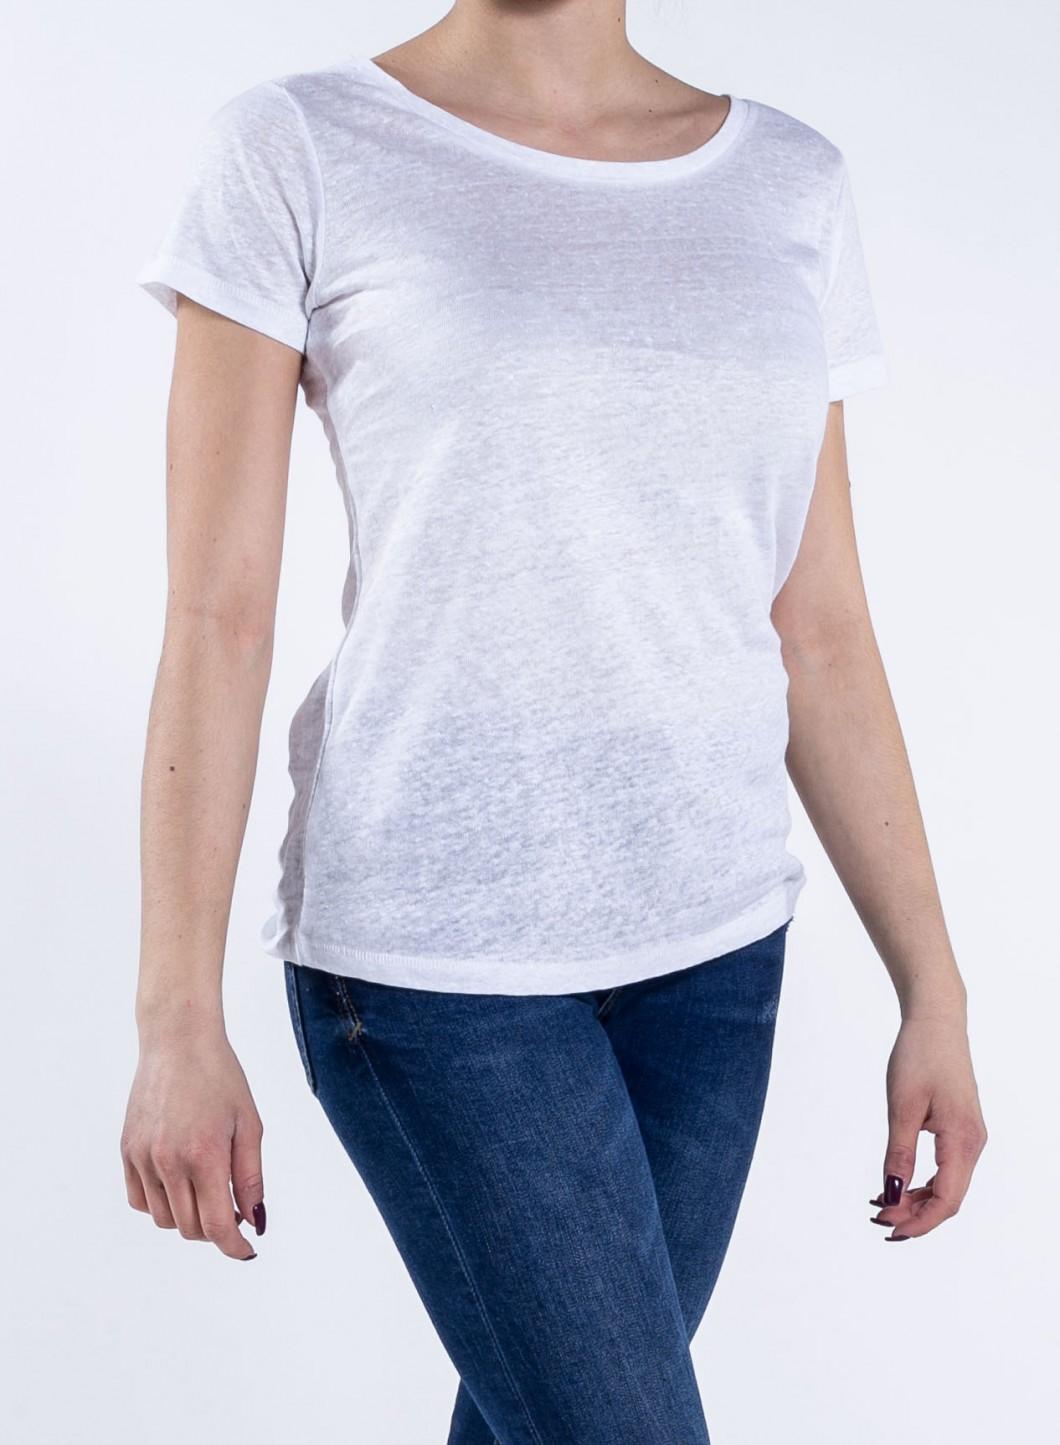 Blouse w linen scoop neck t shirt for Scoop neck t shirt